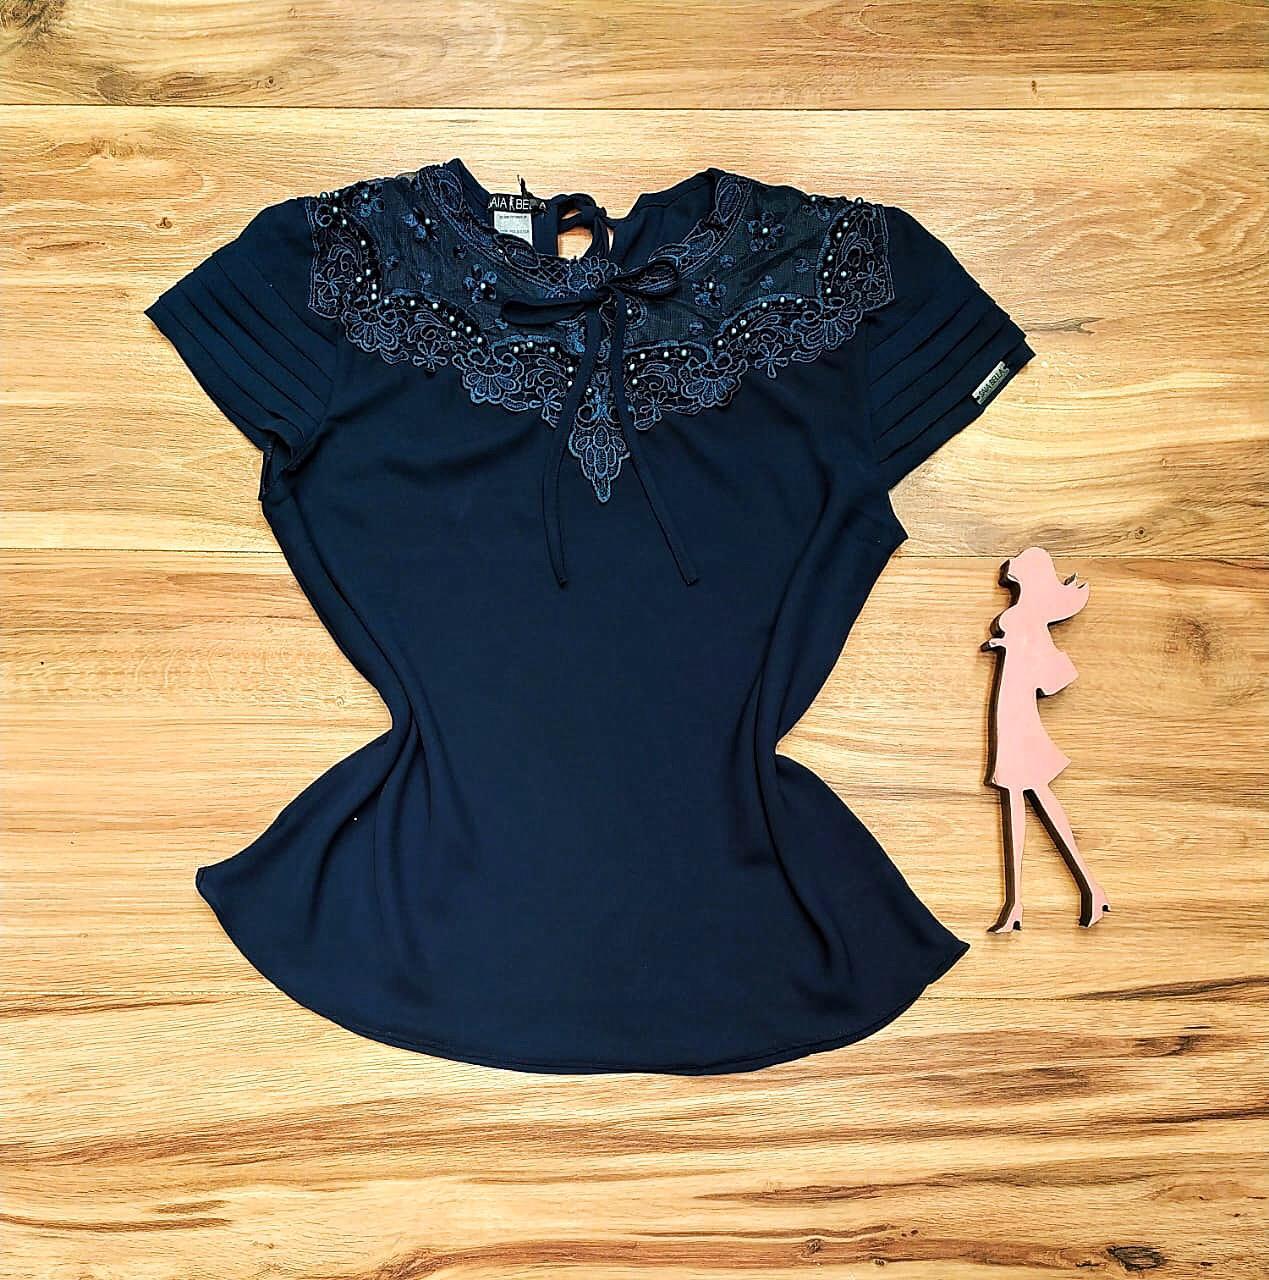 Blusa de Renda Saia Bella  SB9983 azul marinho